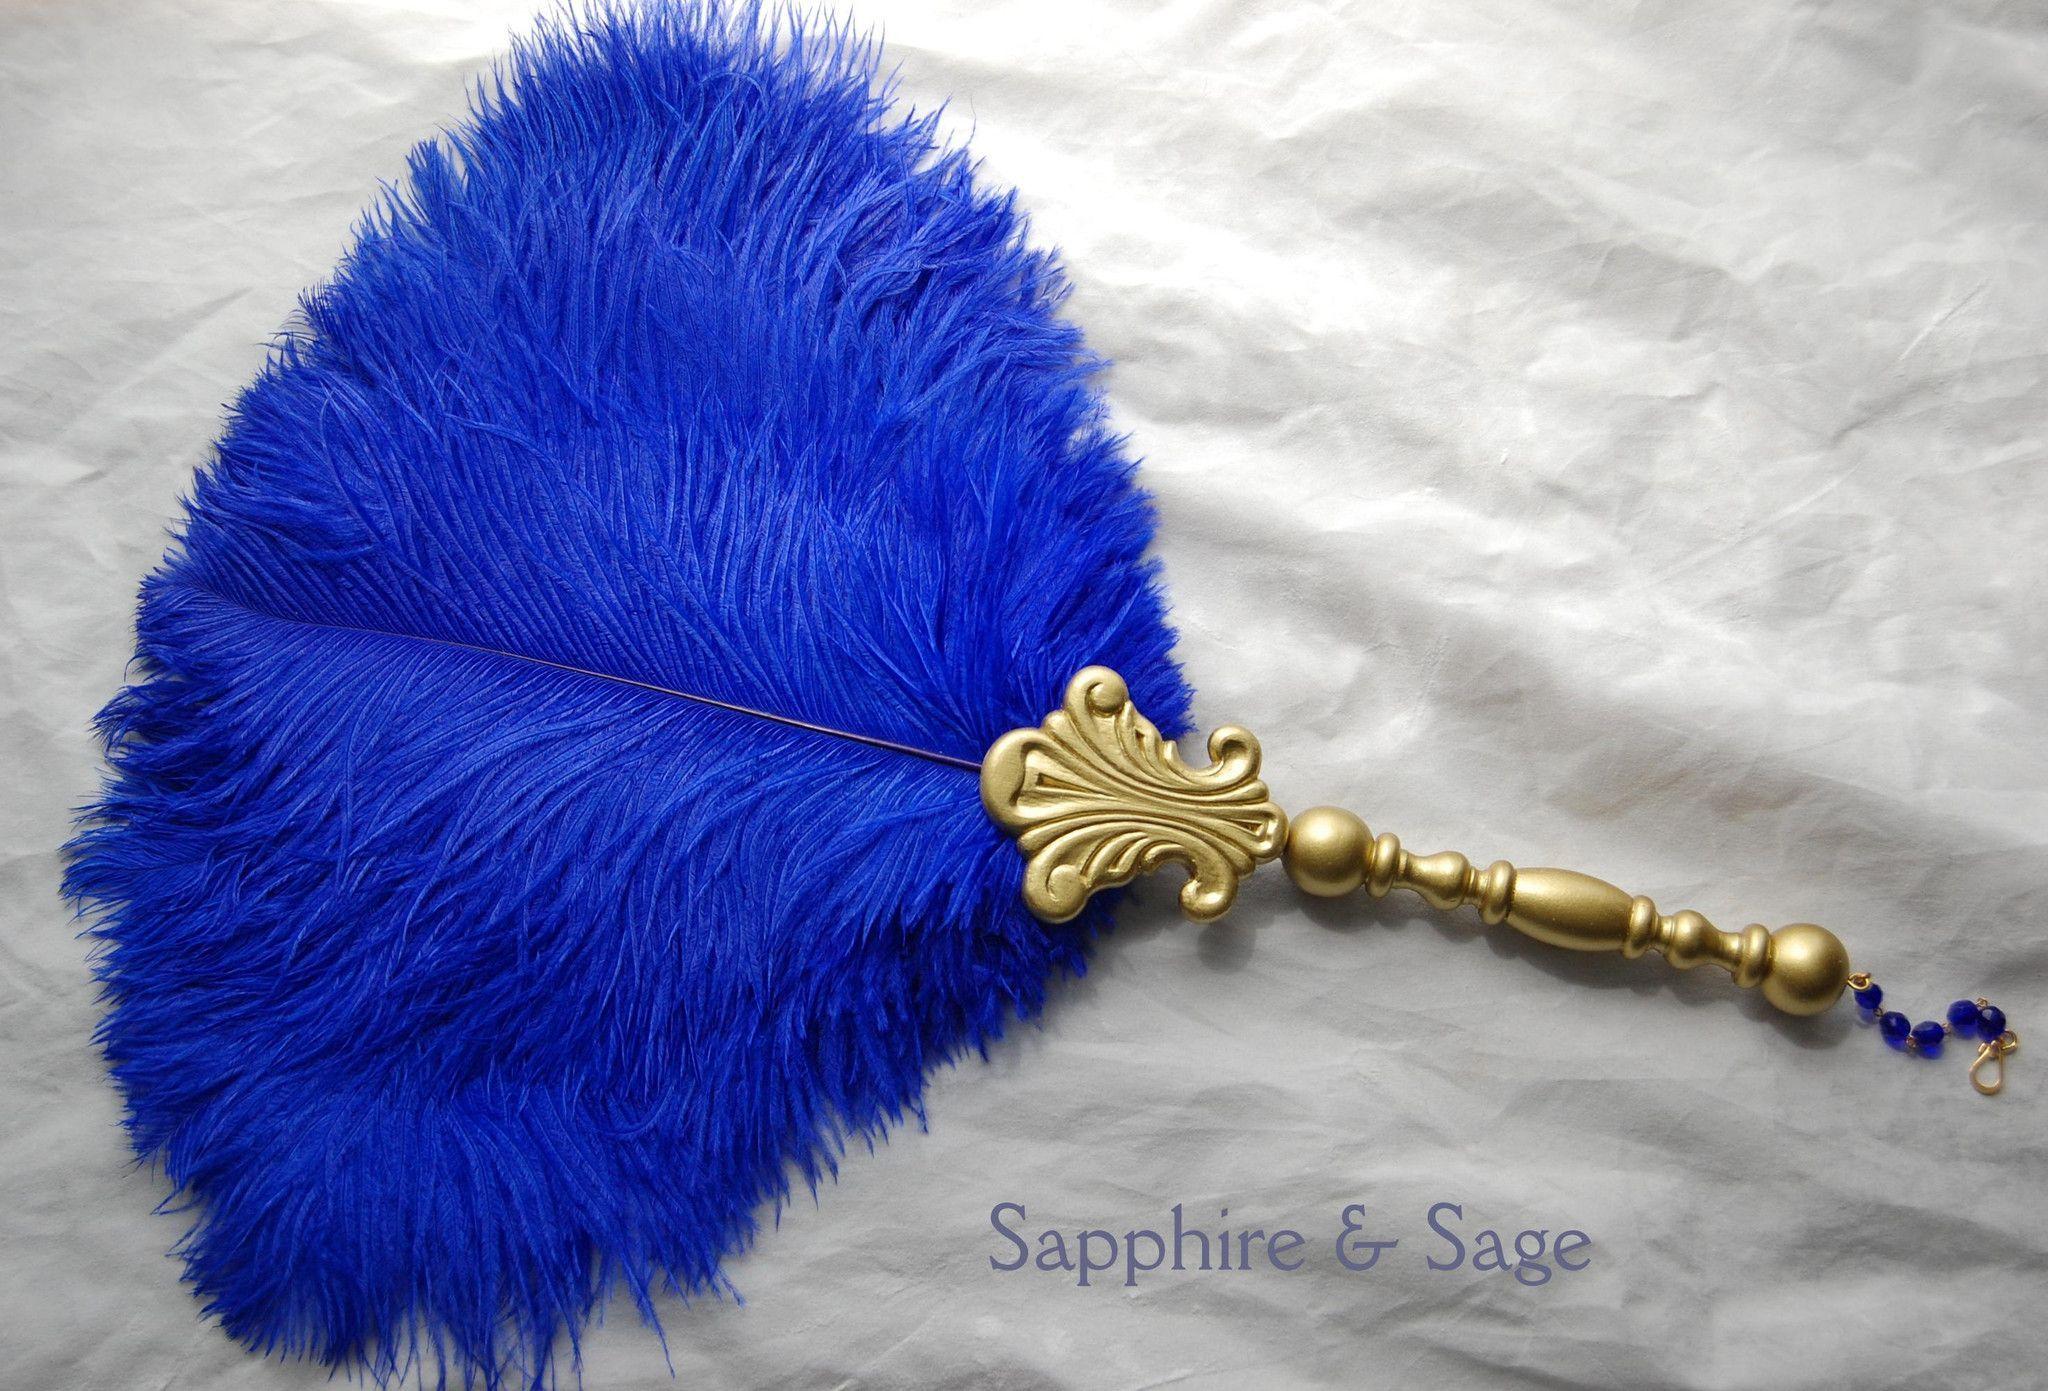 Elspeth Renaissance Feather Fan – Sapphire & Sage Renaissance Jewelry and Accessories